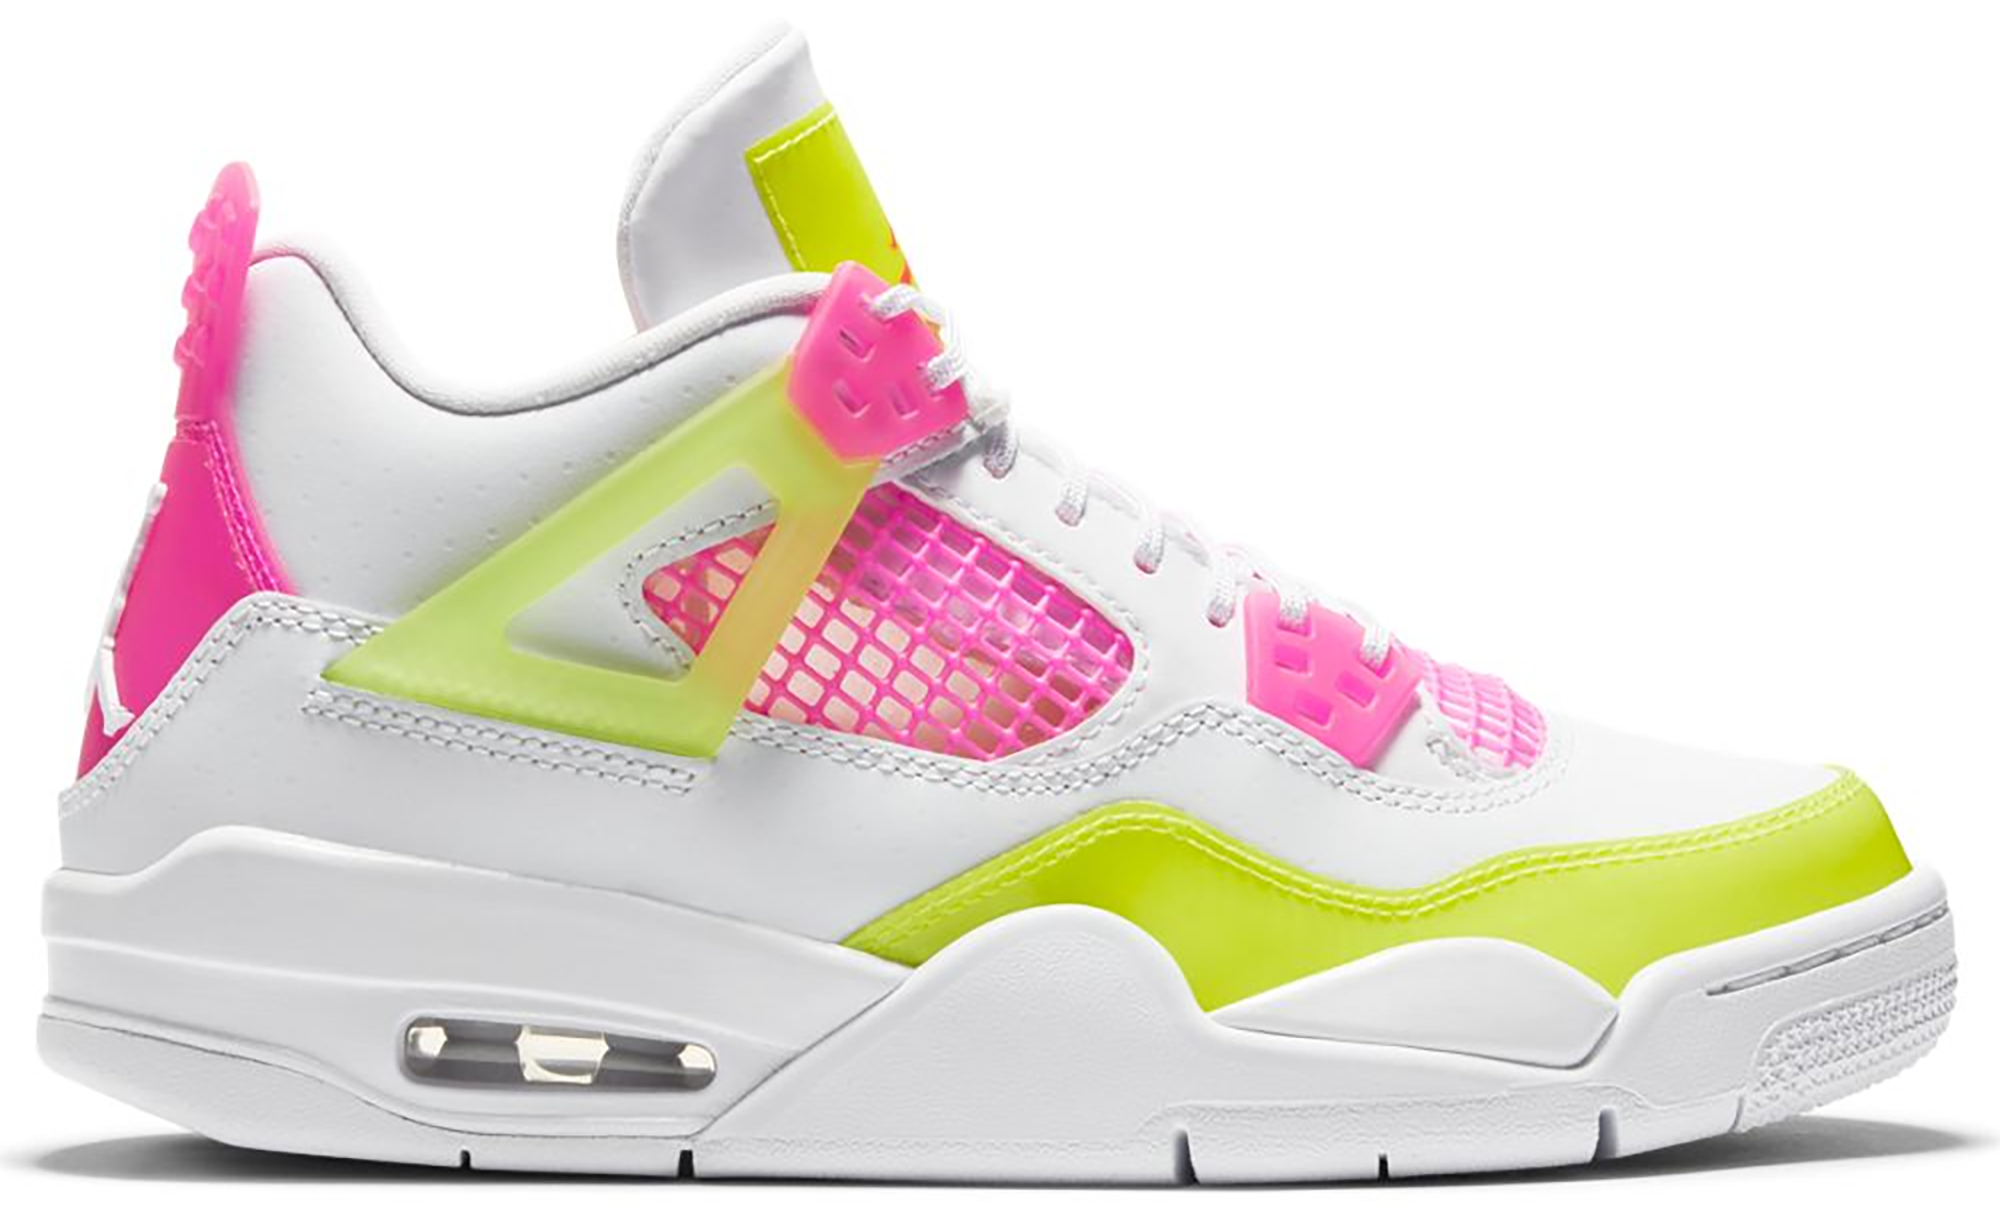 Jordan 4 Retro White Lemon Pink (GS